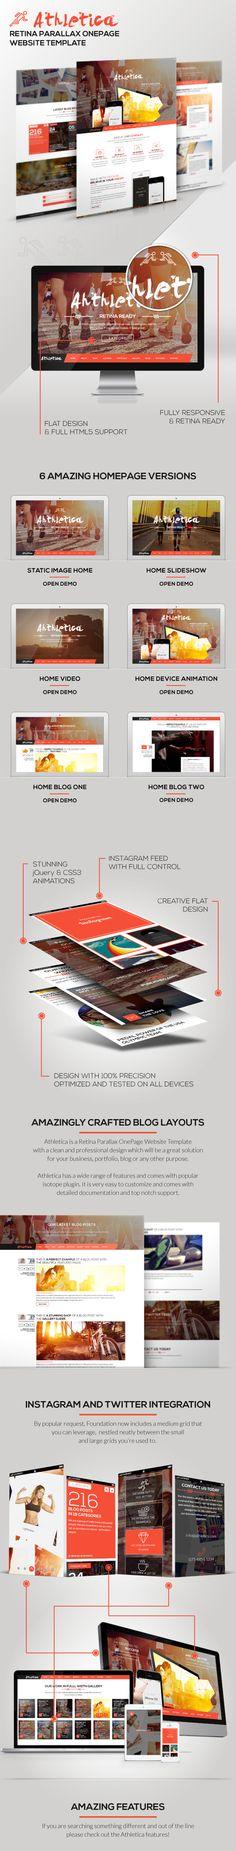 Athletica - Retina Parallax OnePage Web Template on Web Design Served